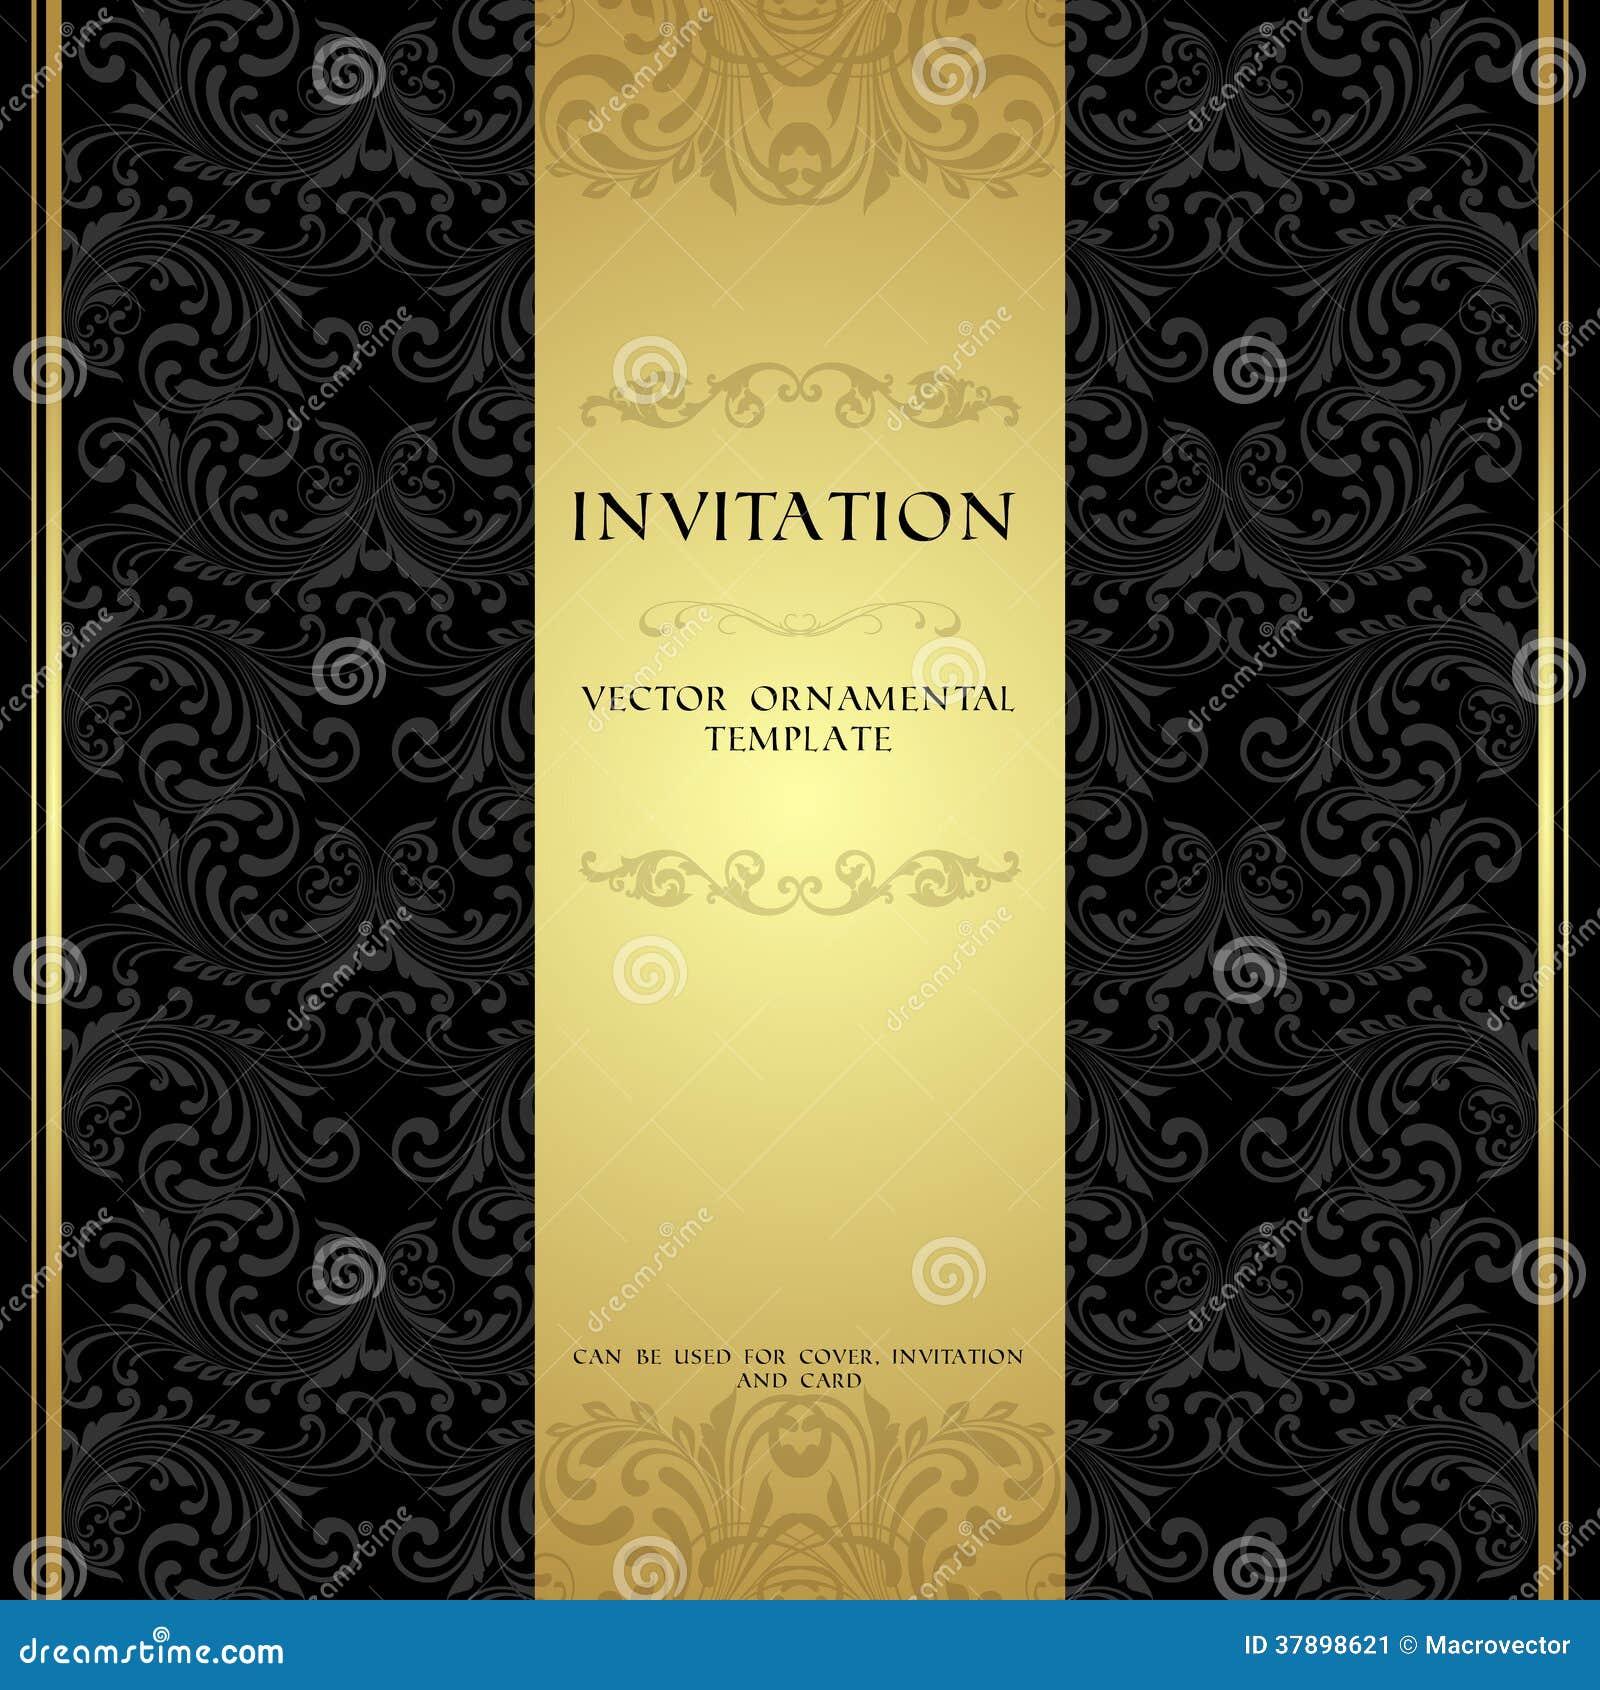 Black And Gold Ornamental Invitation Card Image Image – Black Invitation Cards